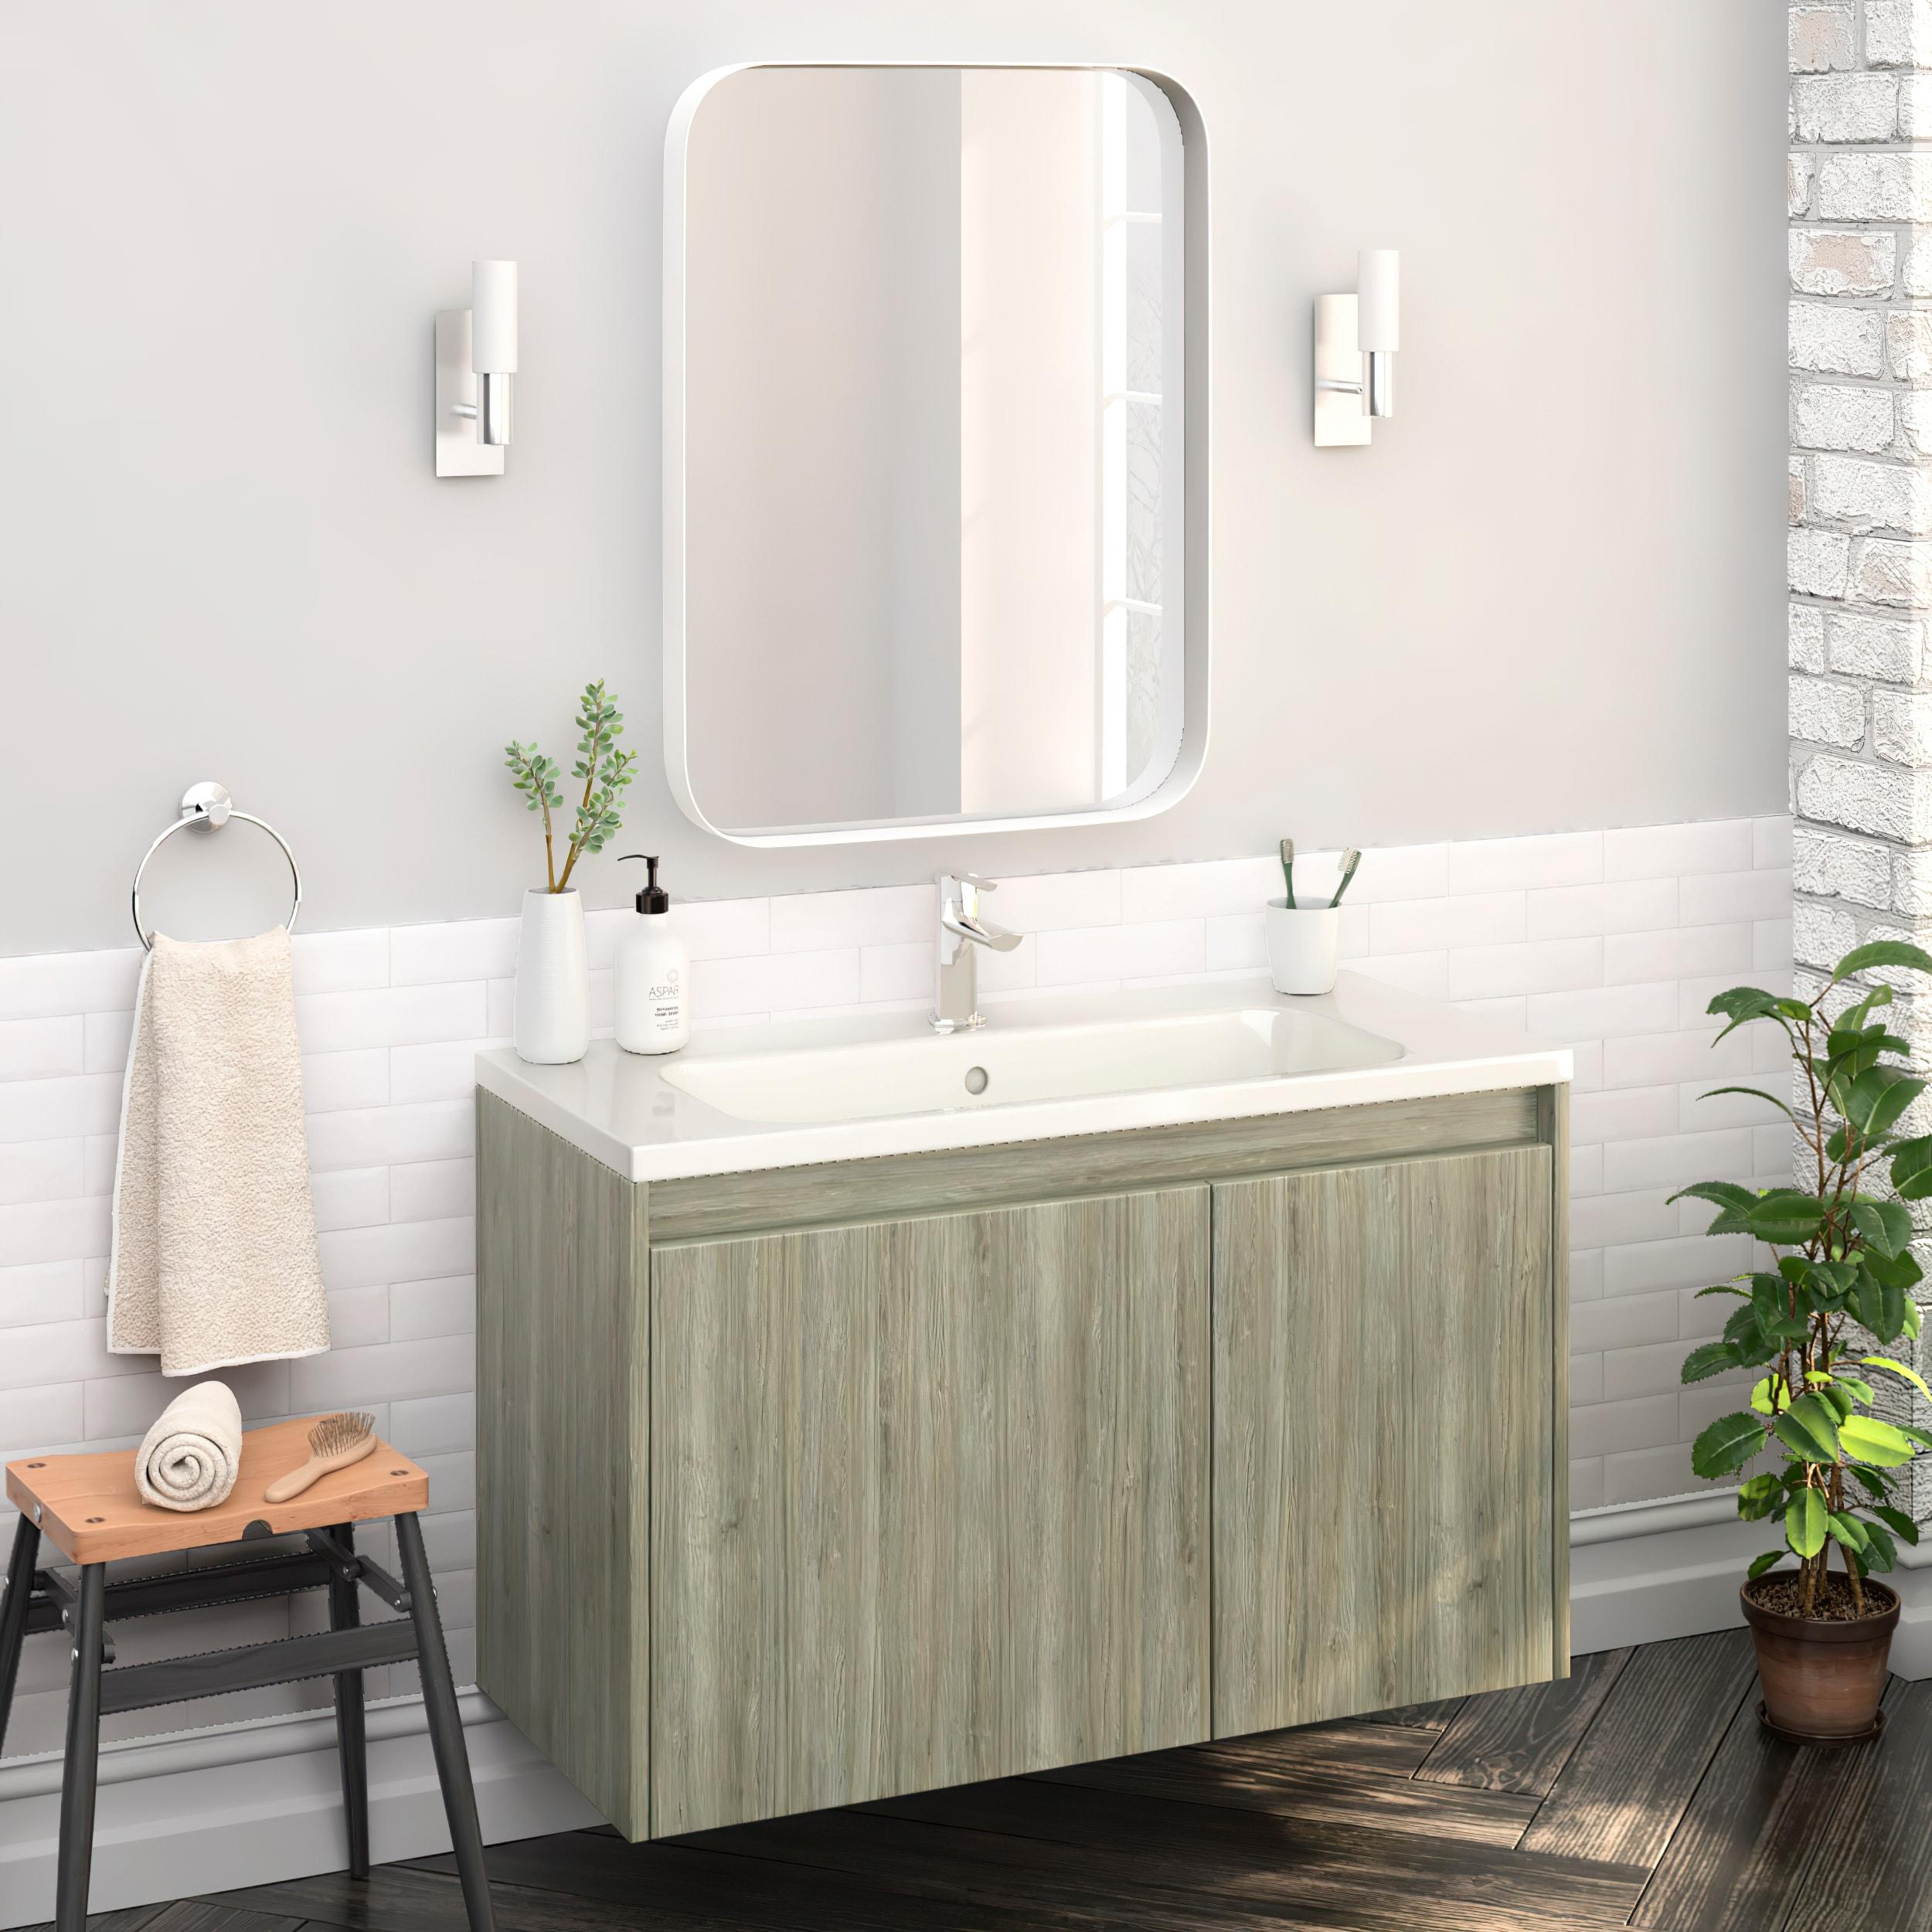 40 Modern Bathroom Vanity Cabinet Village Sahalie Pine Wood 40 X 24 X 18 Inch Vanity Cabinet Ceramic Top Sink On Sale Overstock 31103891